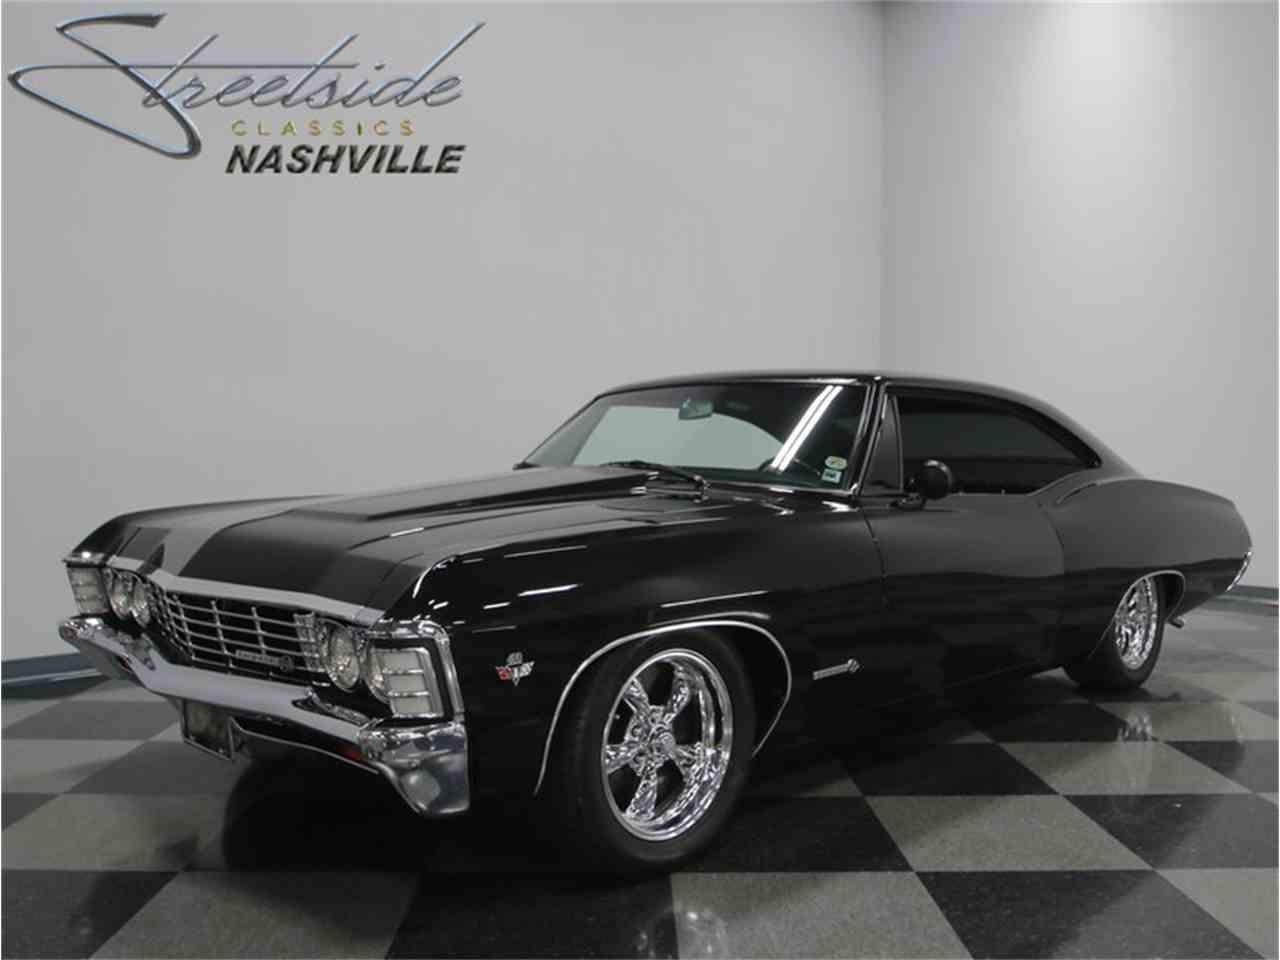 1967 chevrolet impala ss for sale cc 950273. Black Bedroom Furniture Sets. Home Design Ideas